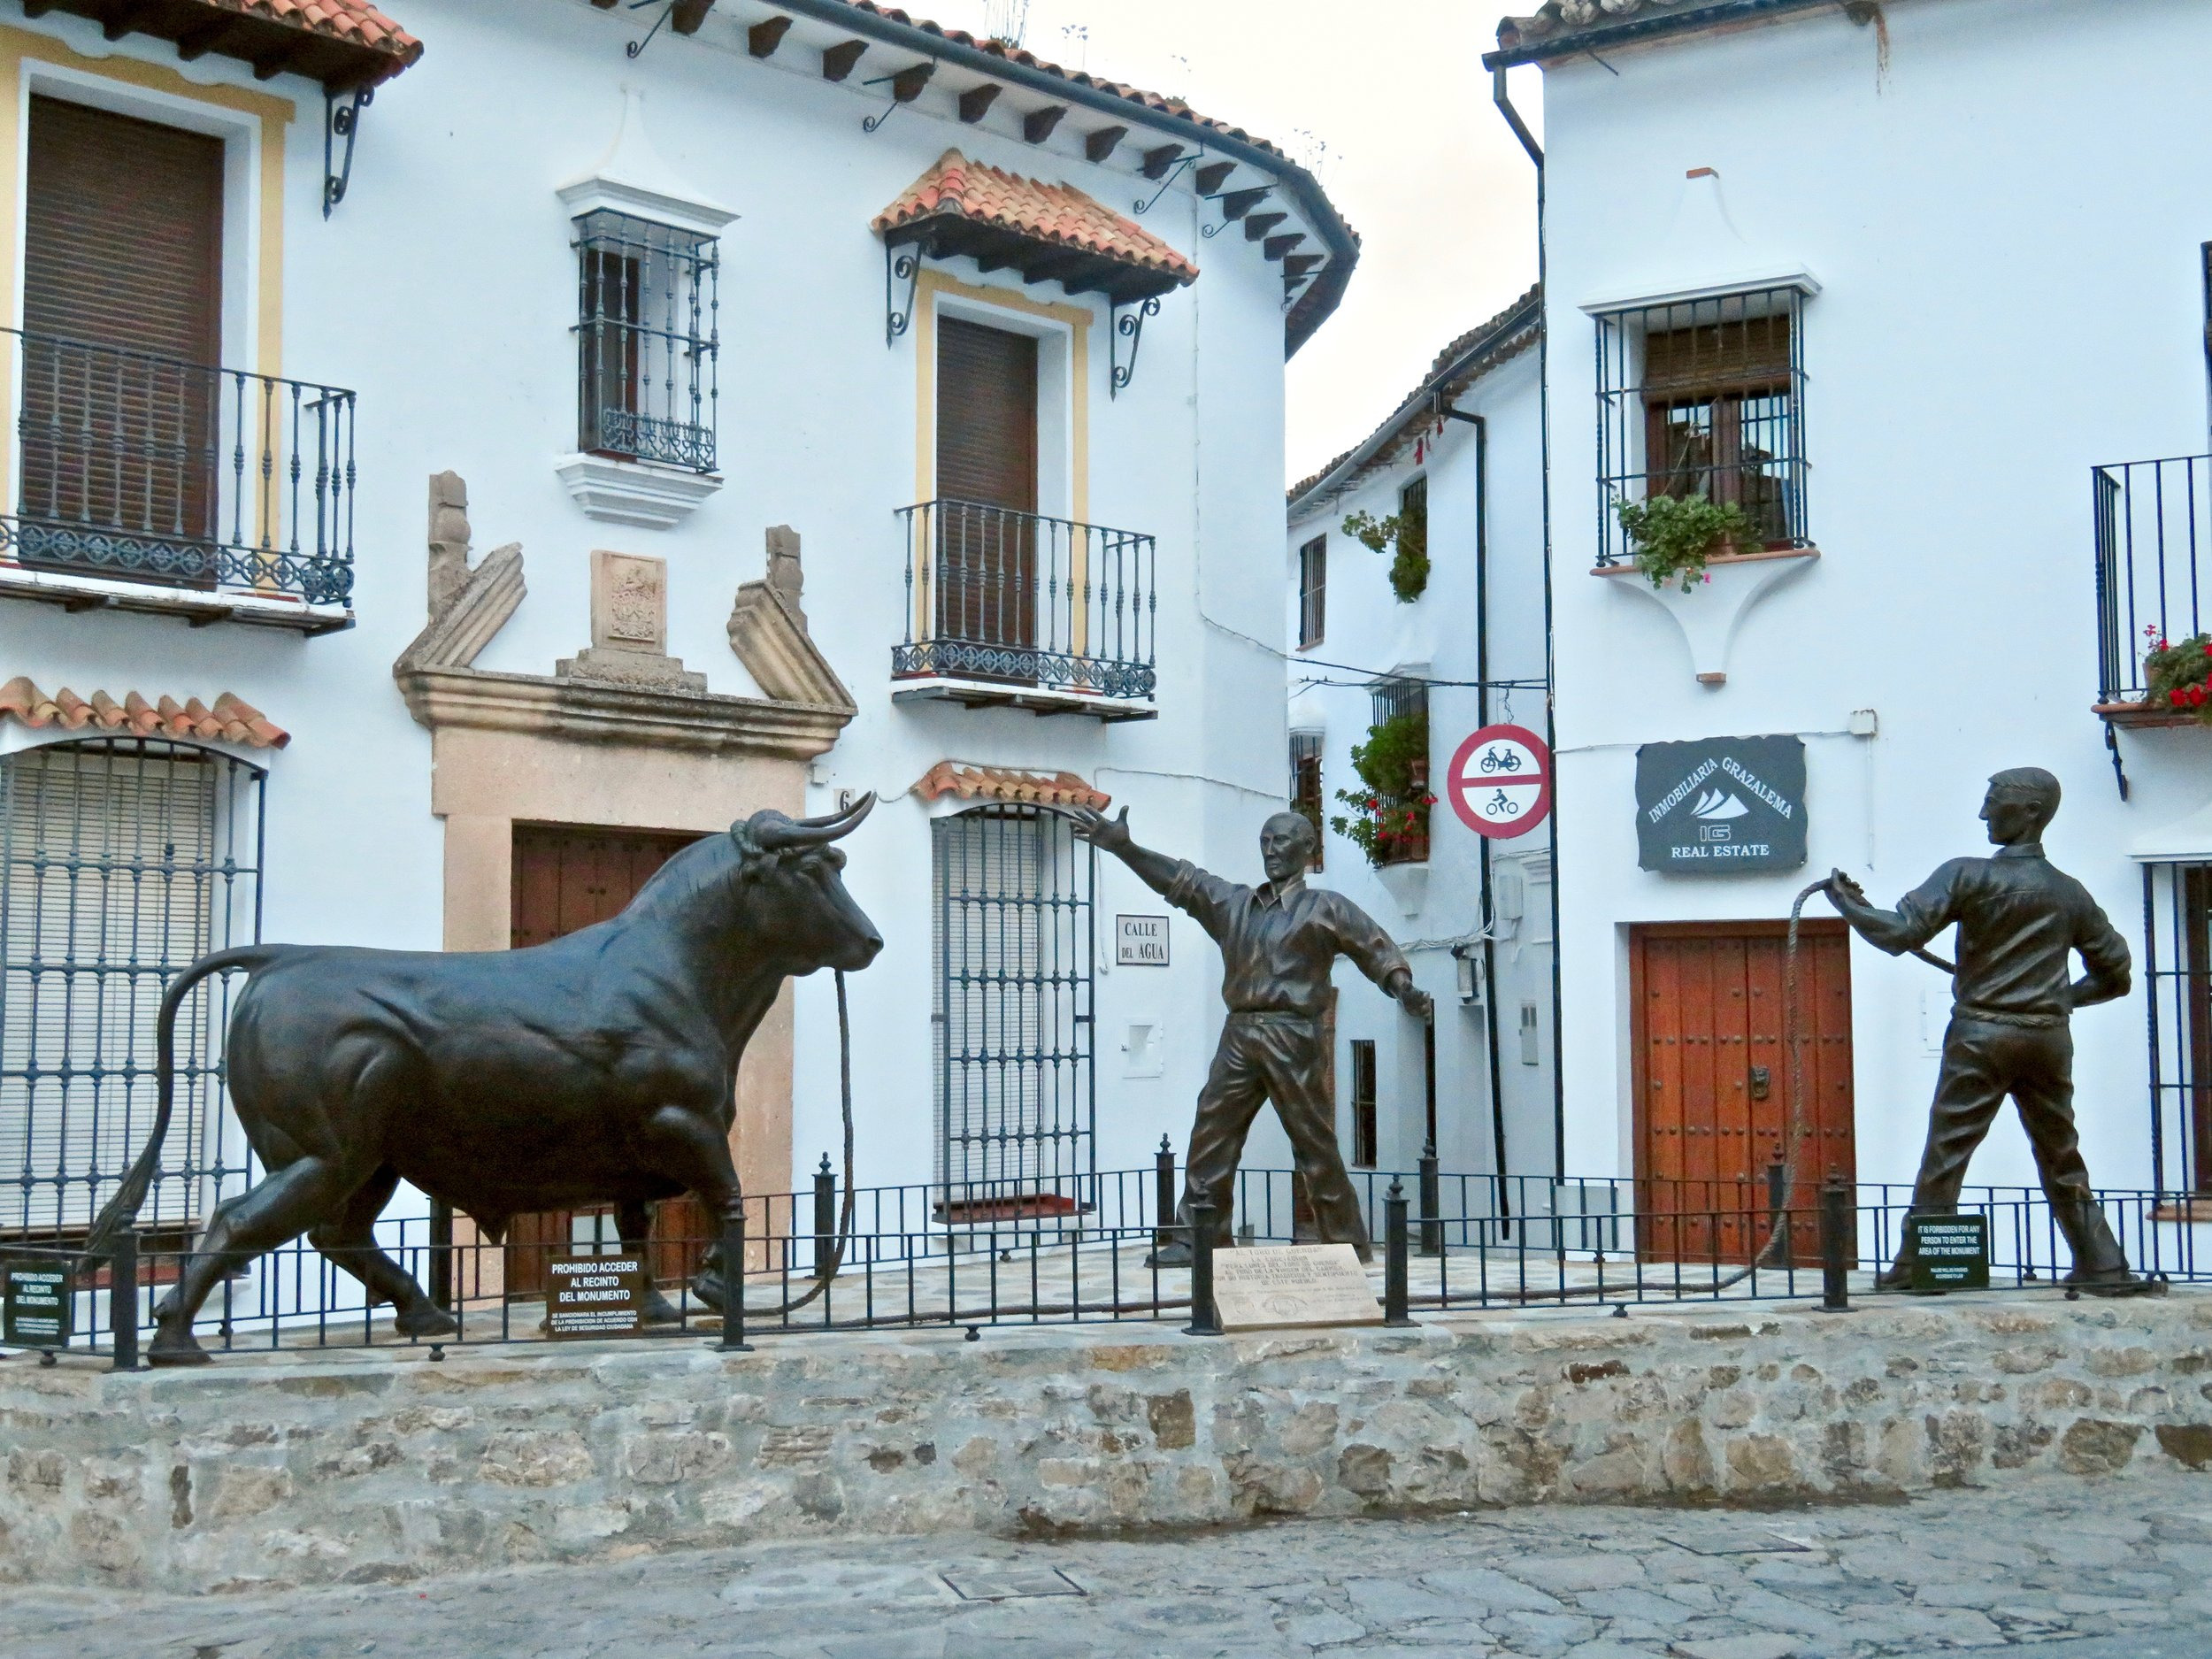 Bull fighting/running is still alive & well in Spain!